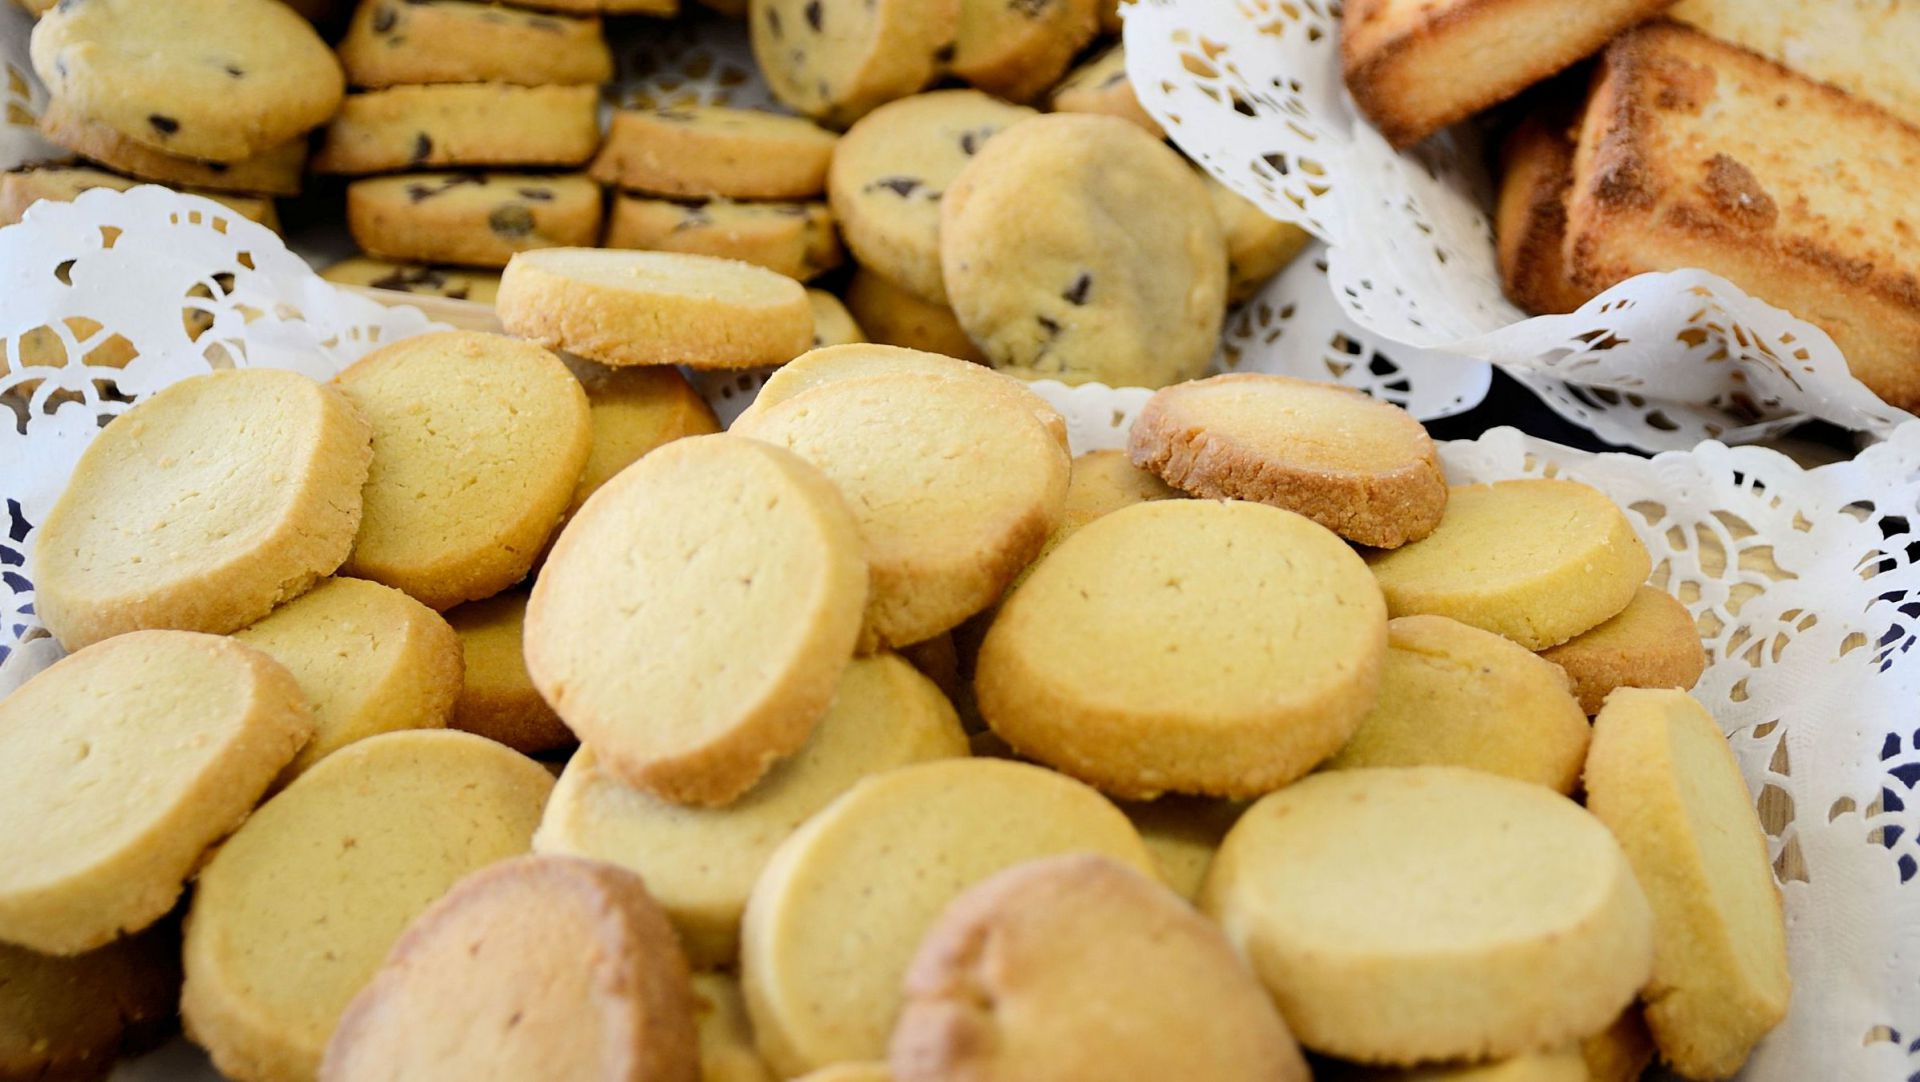 Diamants nature - Notre gamme de biscuits